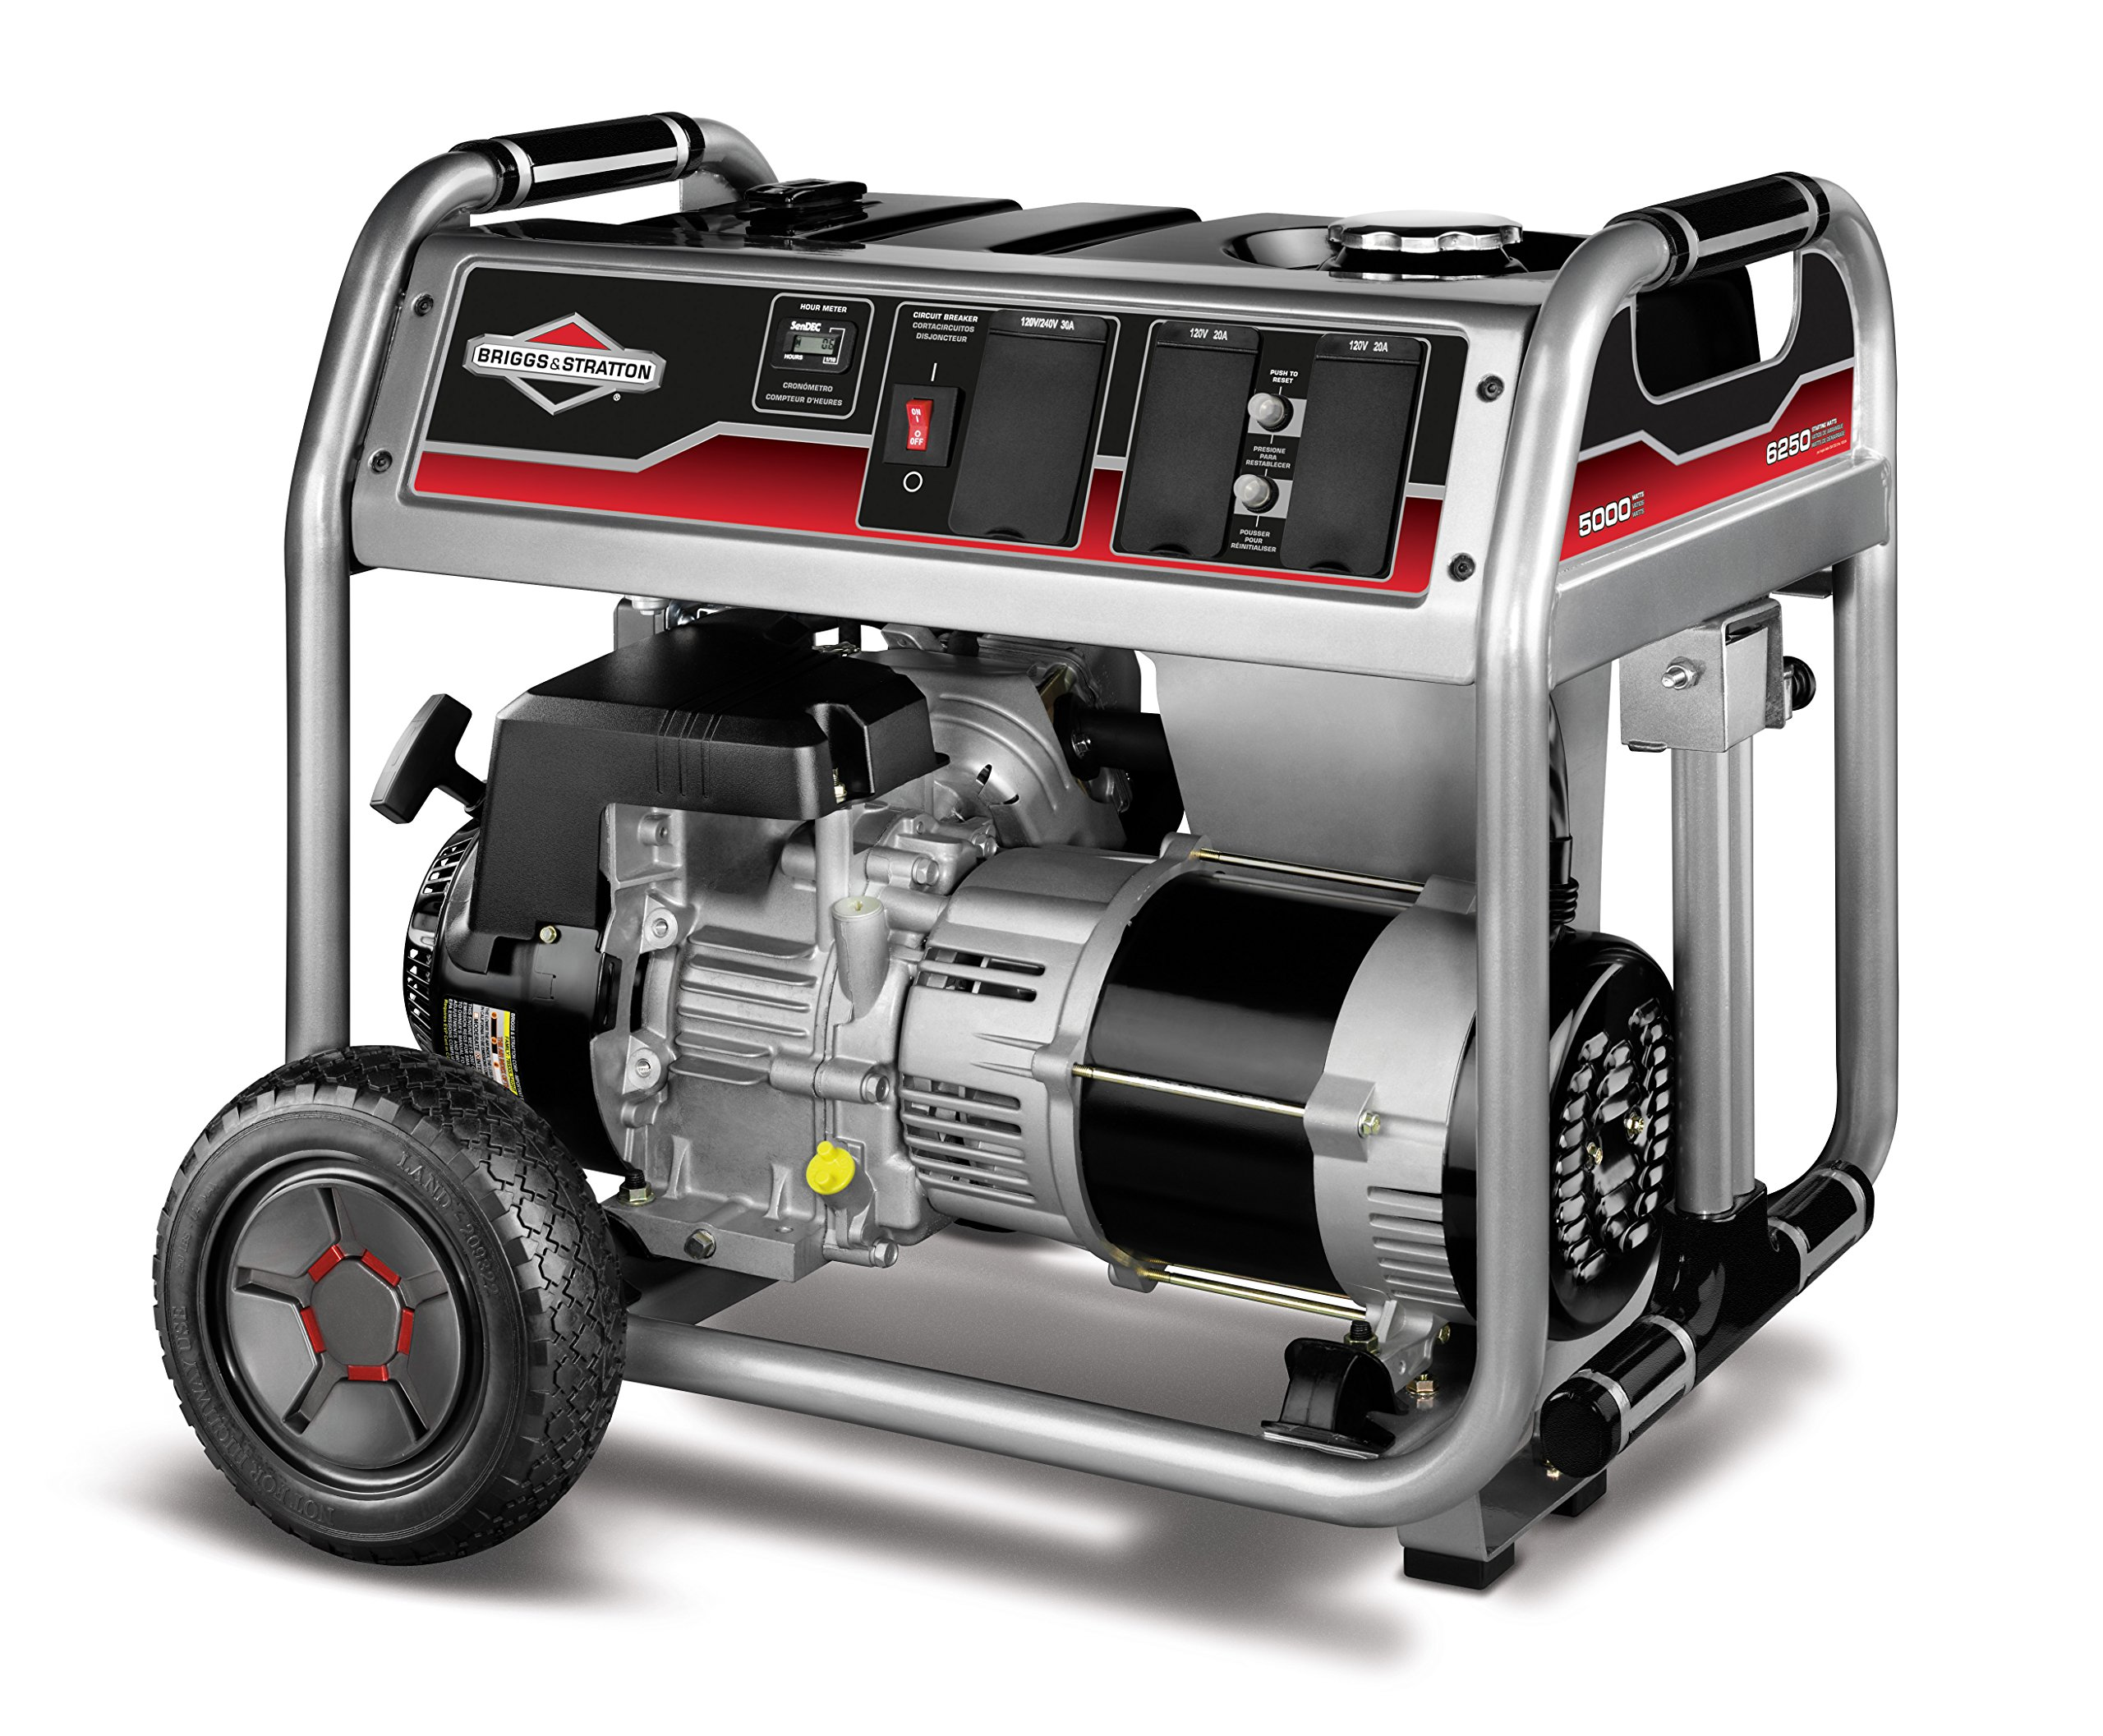 Get Quotations · Briggs & Stratton 30622, 5000 Running Watts/6250 Starting  Watts Gas Powered Portable Generator